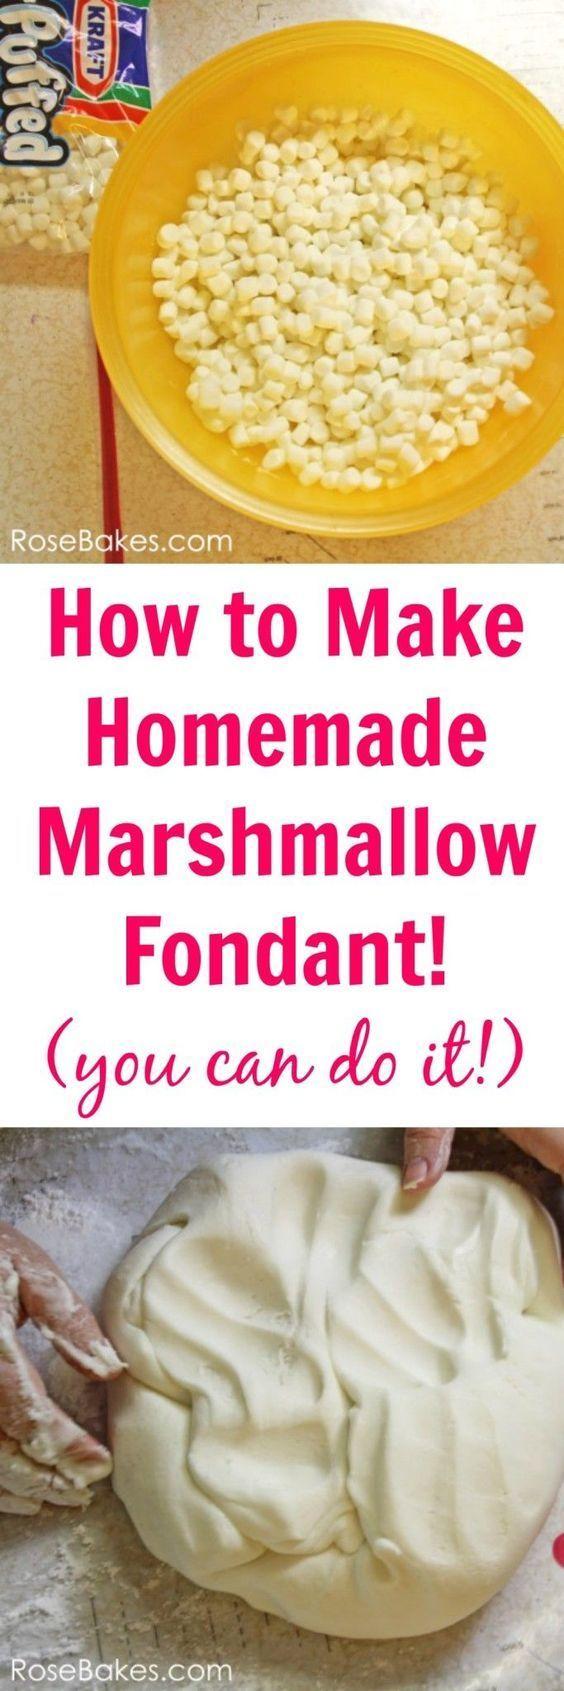 Cake ideas on pinterest pirate cakes marshmallow fondant and - Best 25 Homemade Fondant Recipes Ideas On Pinterest Fondant Recipe For Cakes Making Fondant And Rolled Fondant Recipe